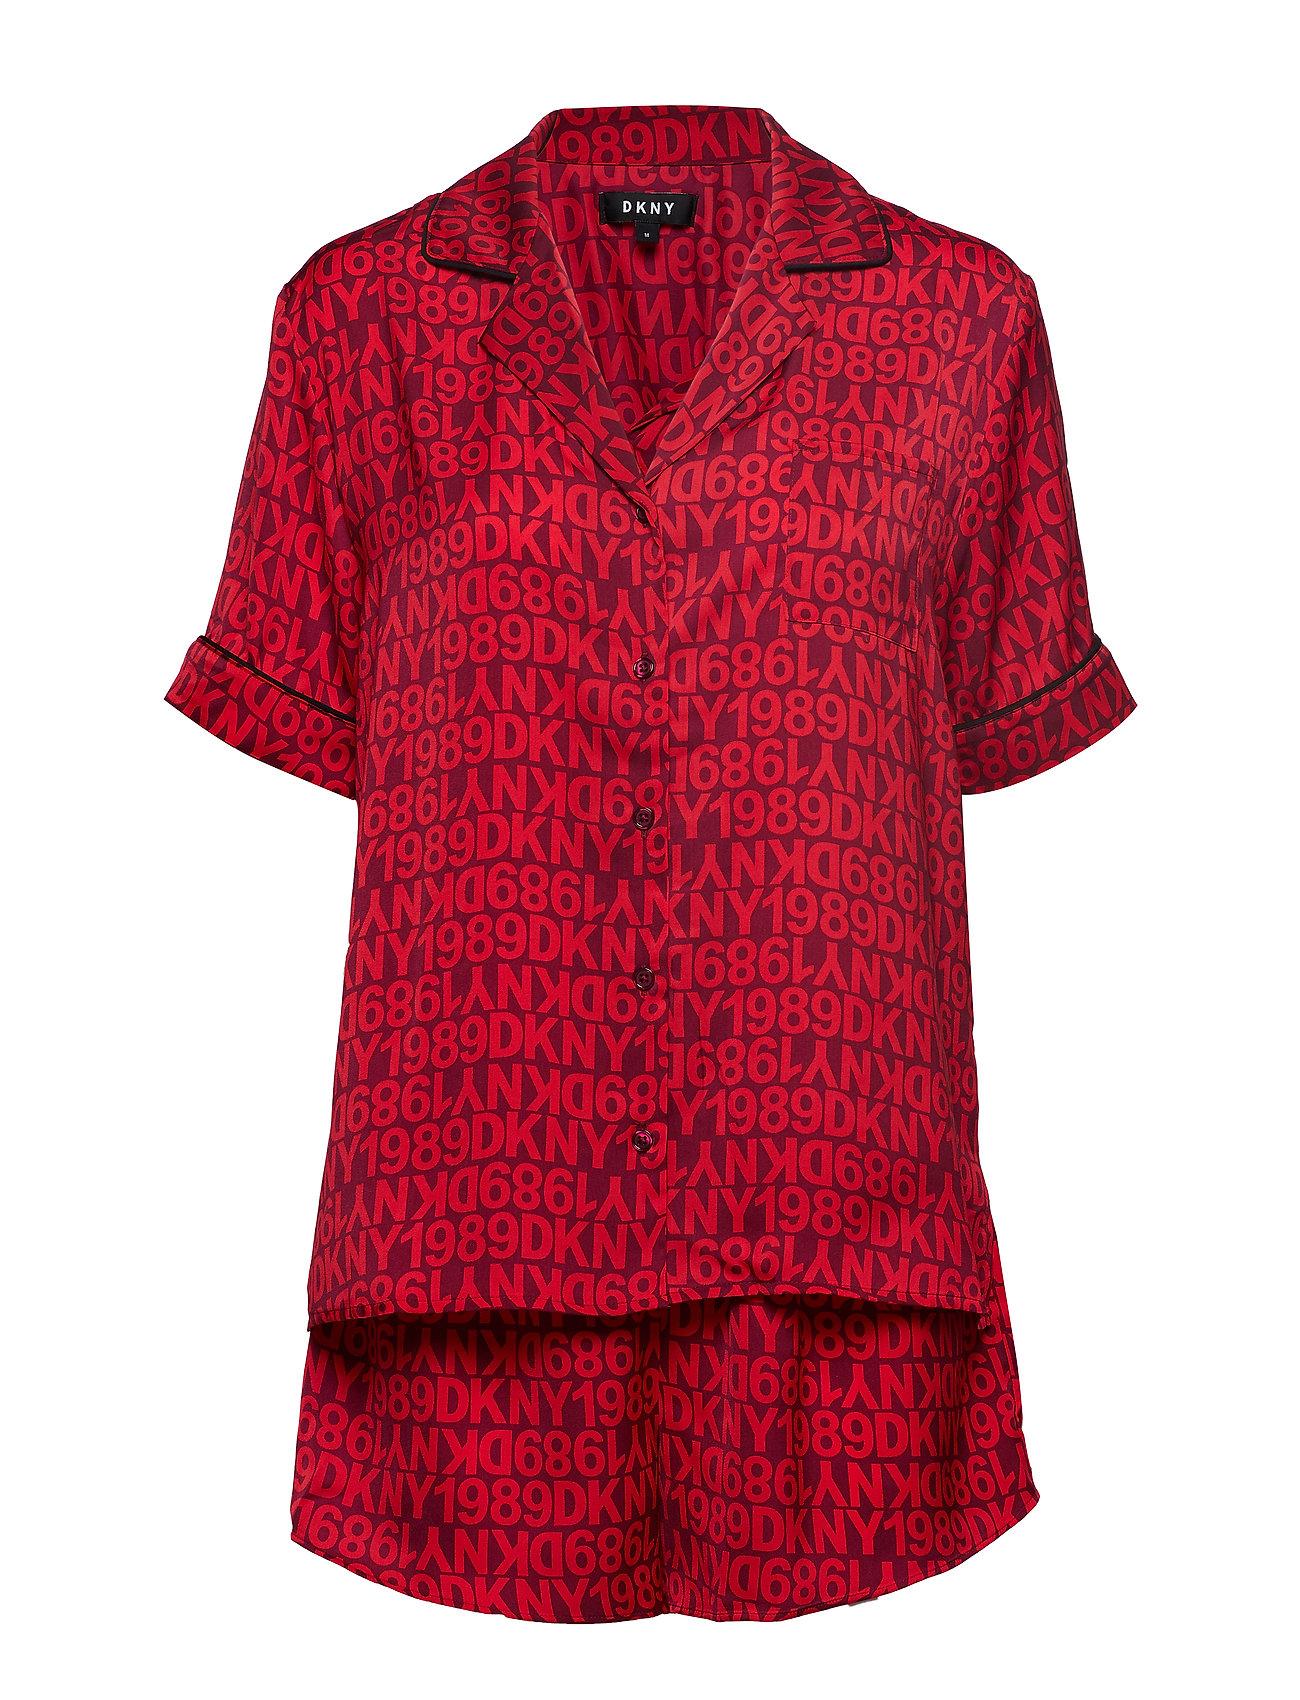 DKNY Dkny Only In Dkny Top & Boxer Pj Set Pyjama Rot DKNY HOMEWEAR